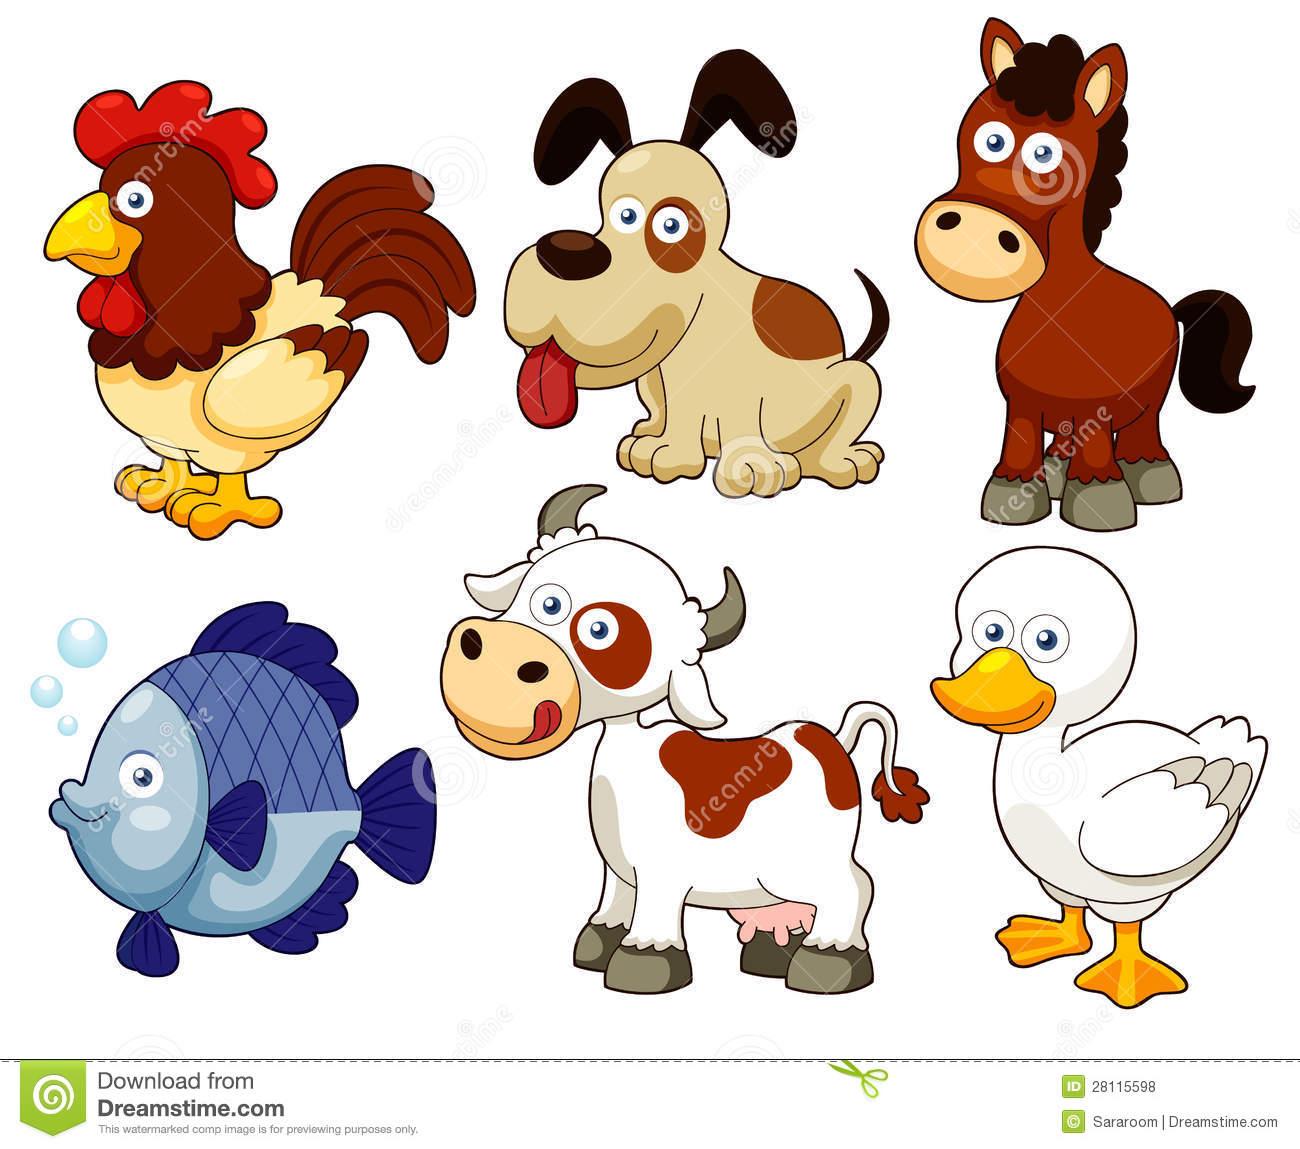 Farm Animals Free Download Clipart-Farm Animals Free Download Clipart-16